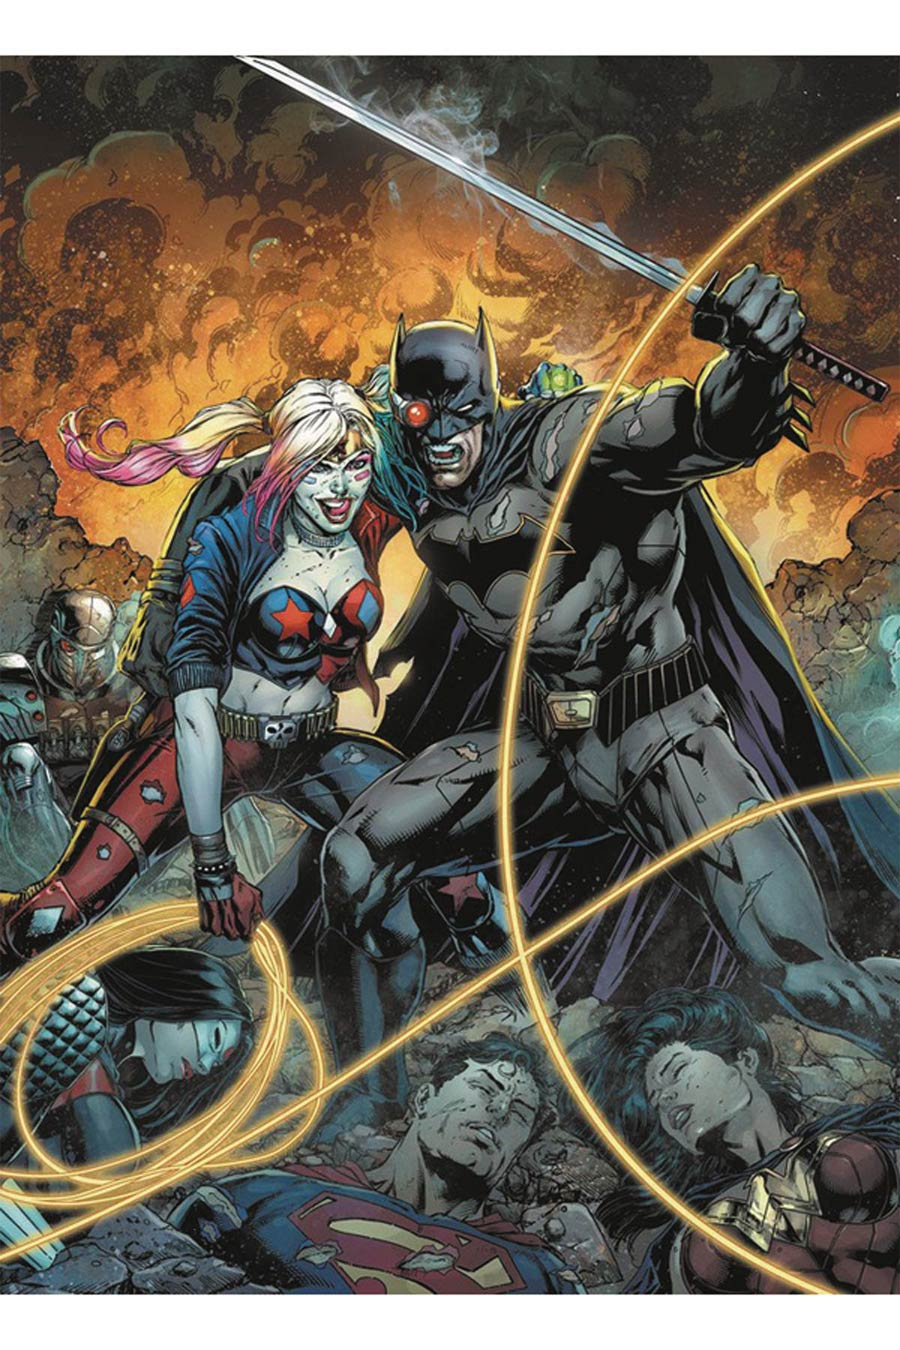 Justice League vs Suicide Squad #1 Cover E DF Gold Elite Signature Series Signed By Joshua Williamson